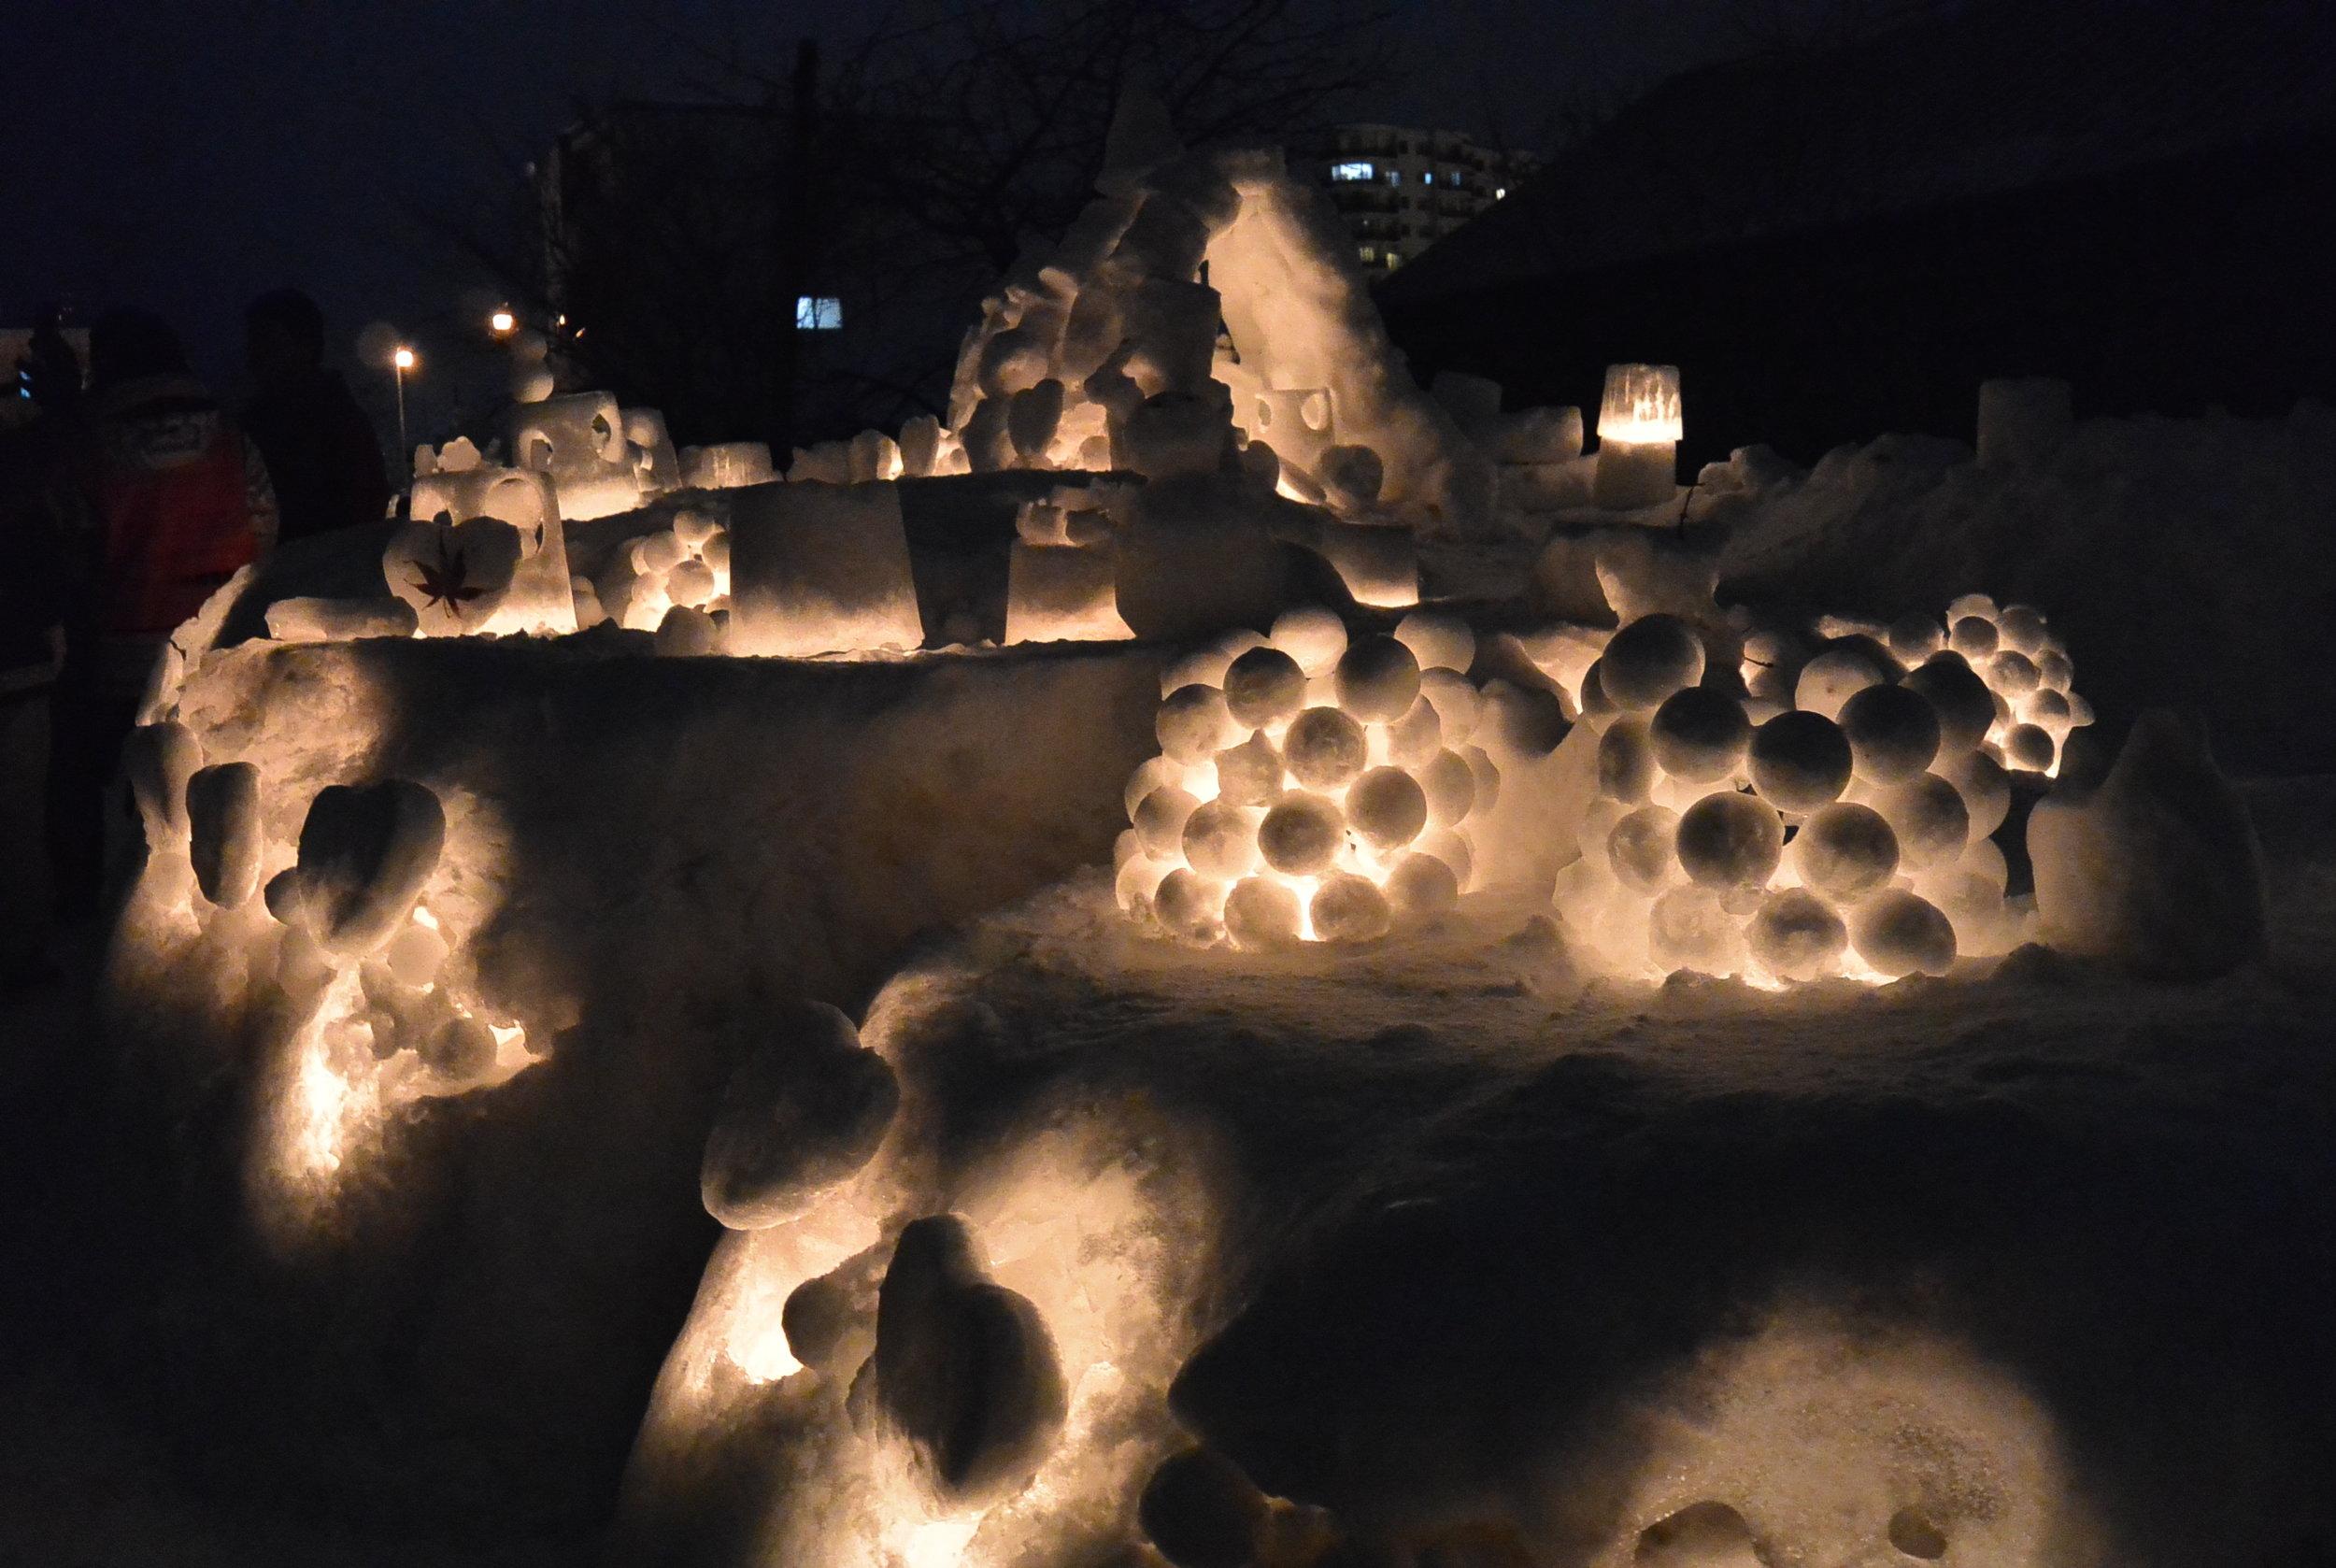 Day 4: Otaru Lights Festival